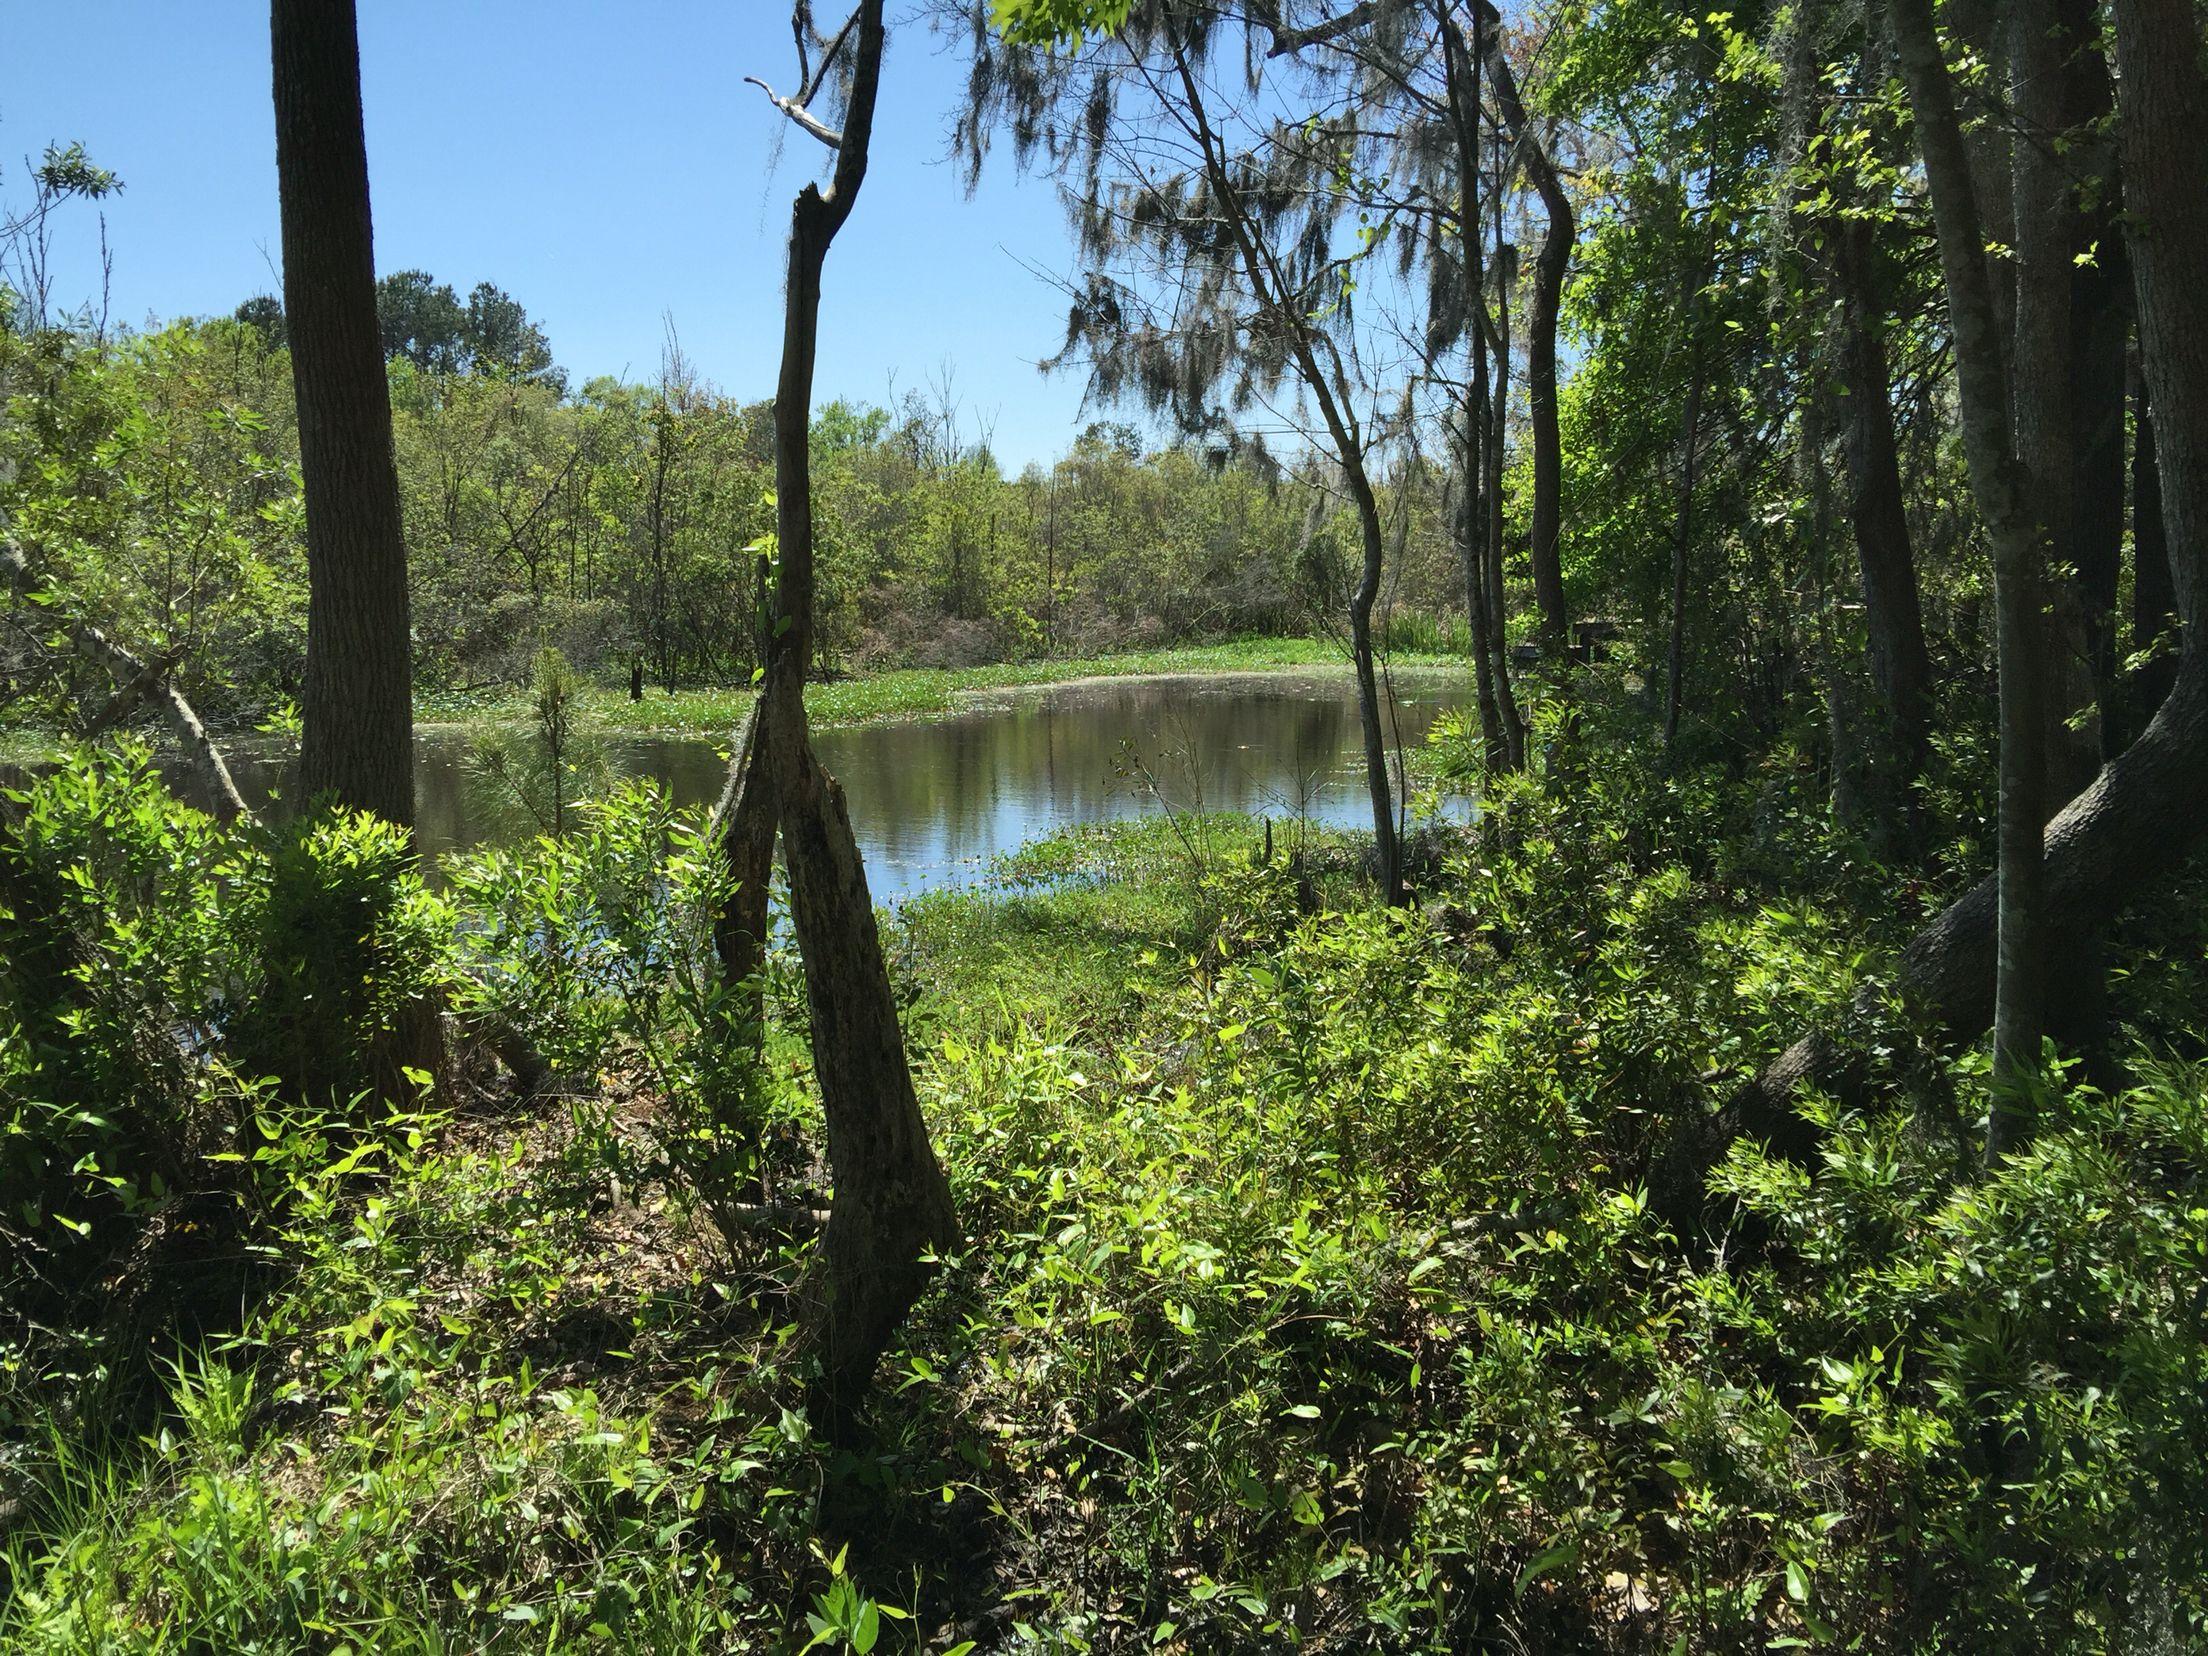 goose creek reservoir my backyard hanahan south carolina